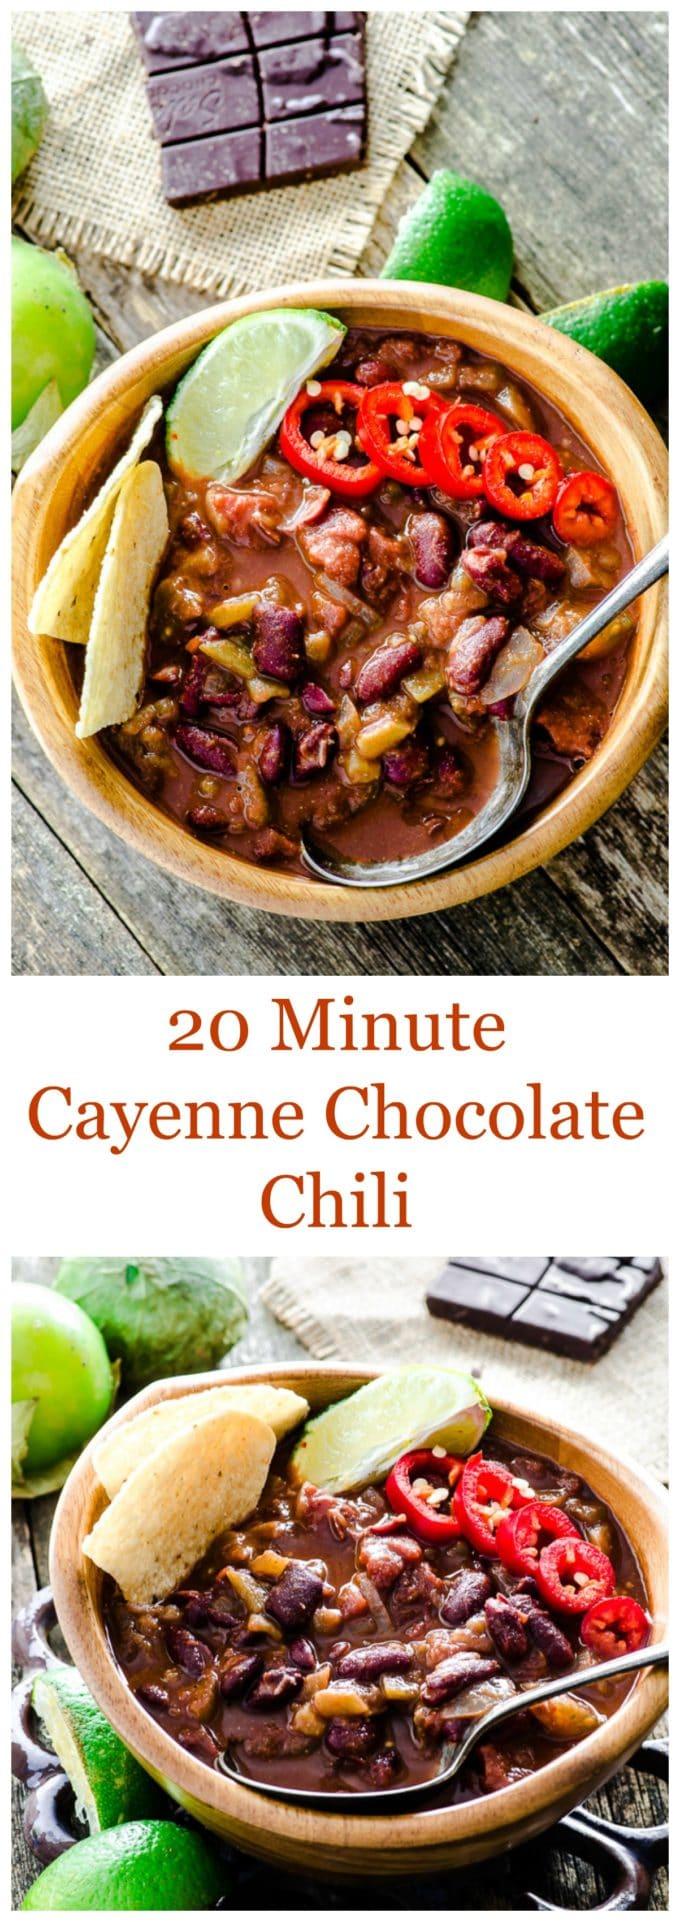 20-MINUTE-CAYENNE-CHOCOLATE-CHILI.jpg